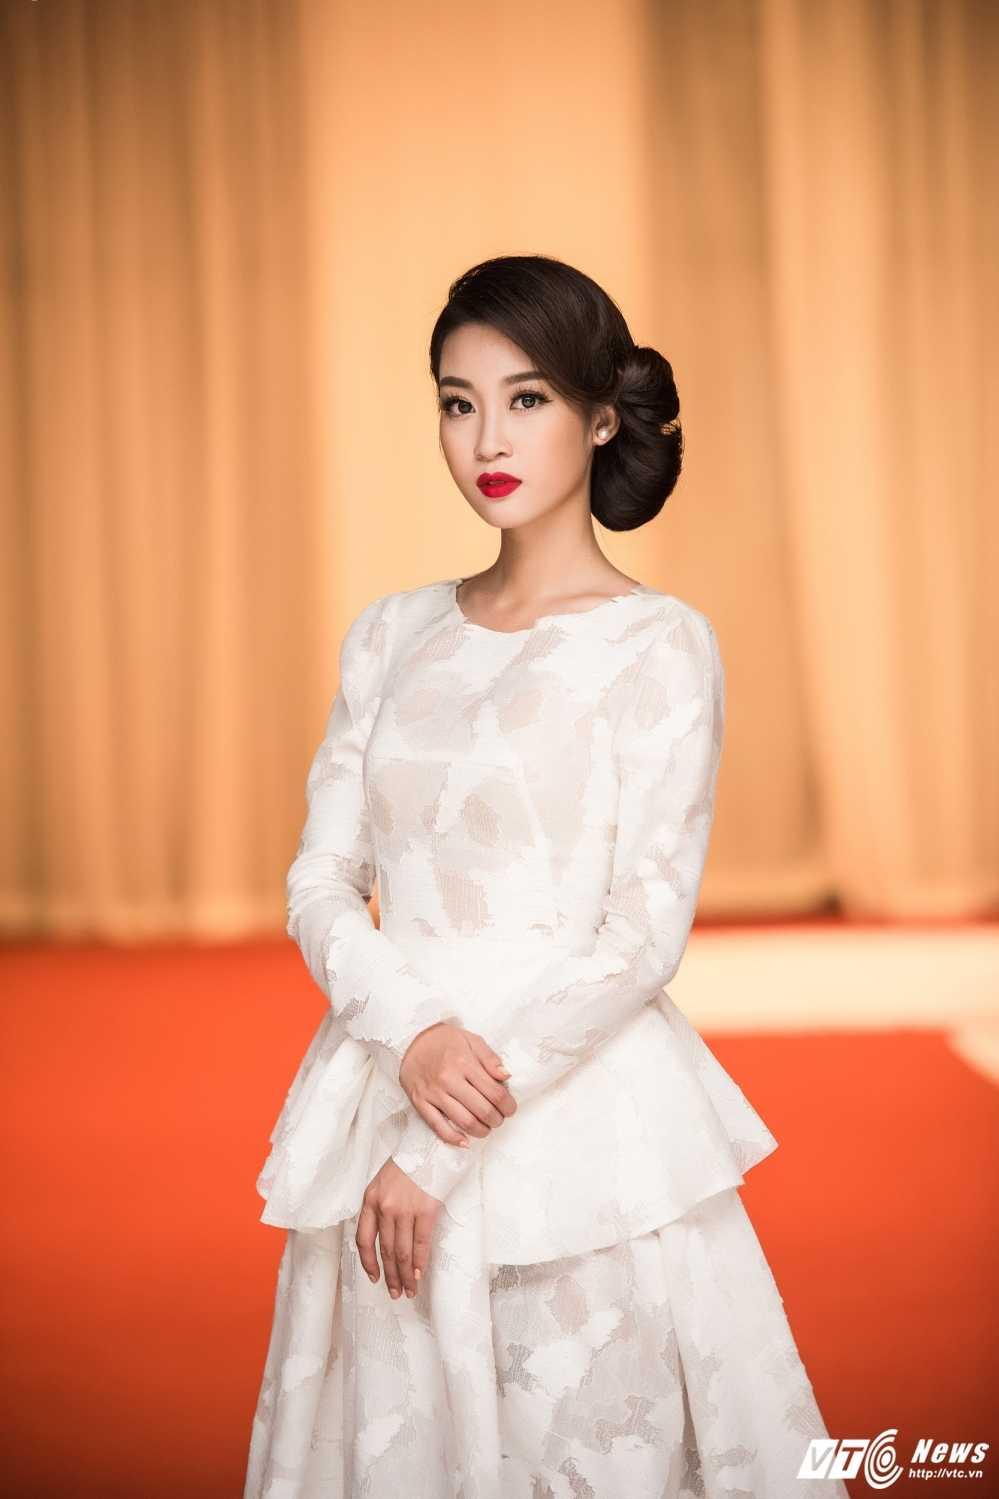 Hoa hau My Linh do sac voi chi em A hau Thanh Tu -Tra My hinh anh 6